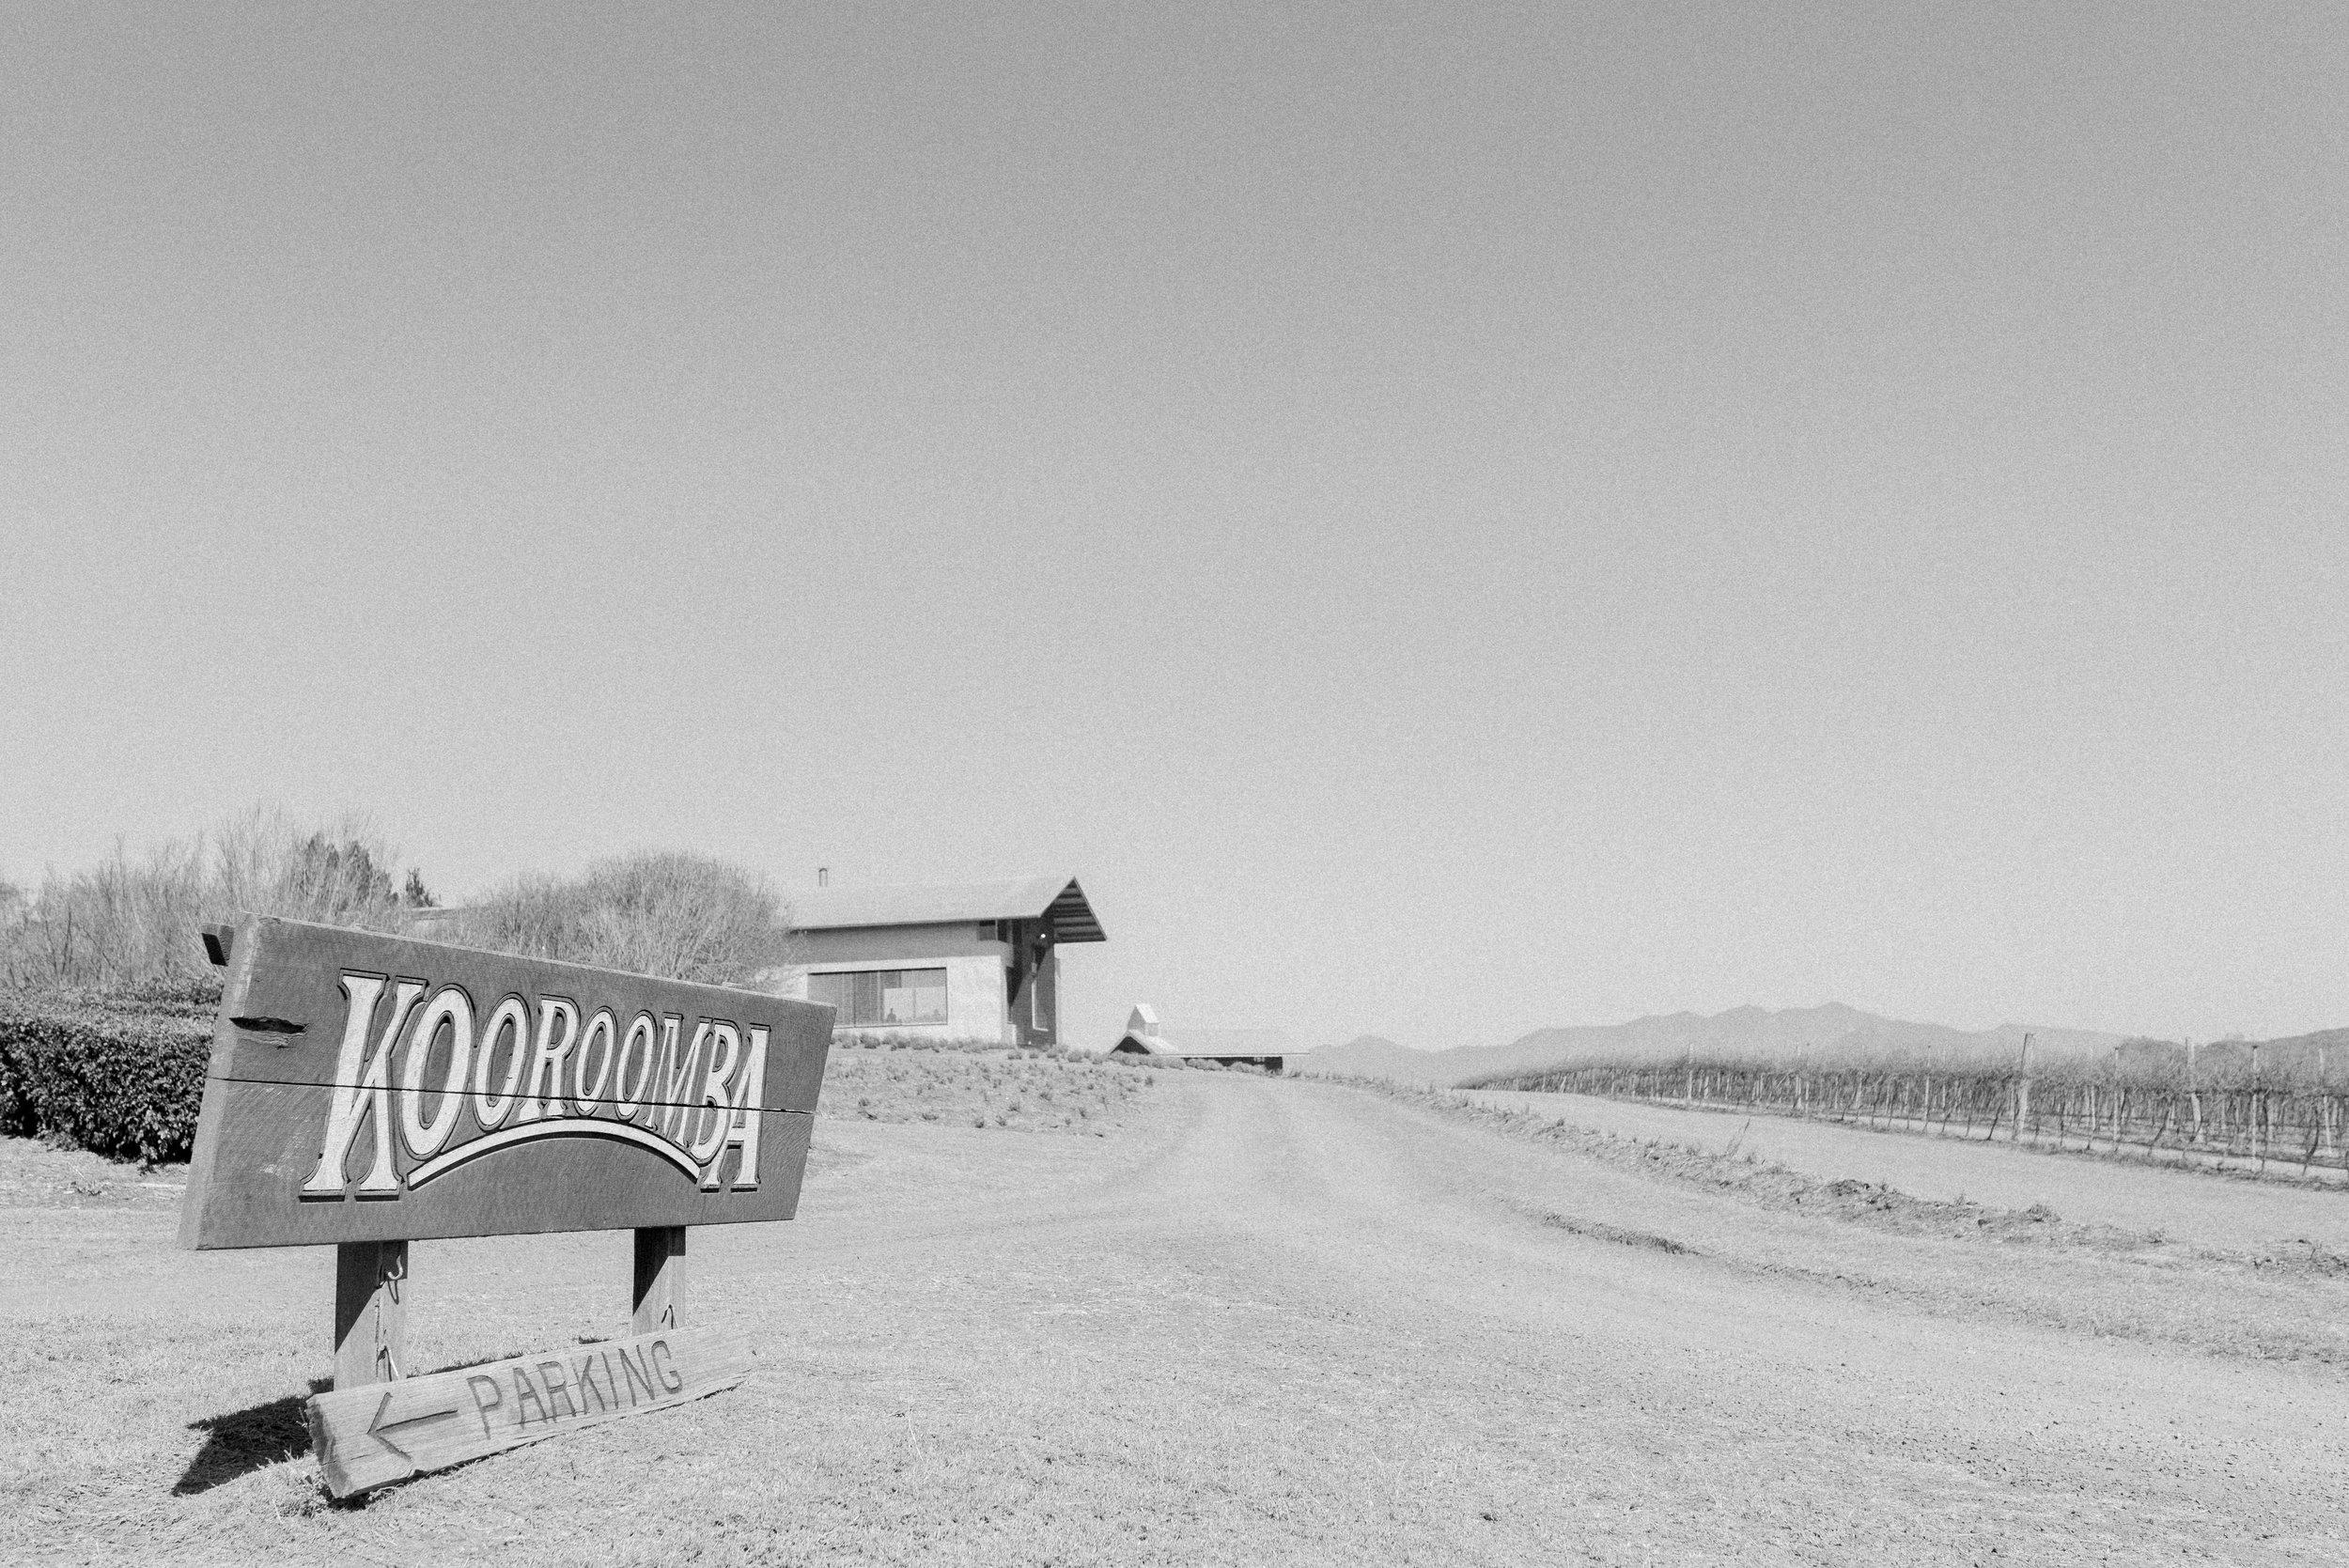 Kooroomba-Vineyard-Lavender-Farm-Wedding-Fine-Art-Lauren-Olivia-33.jpg